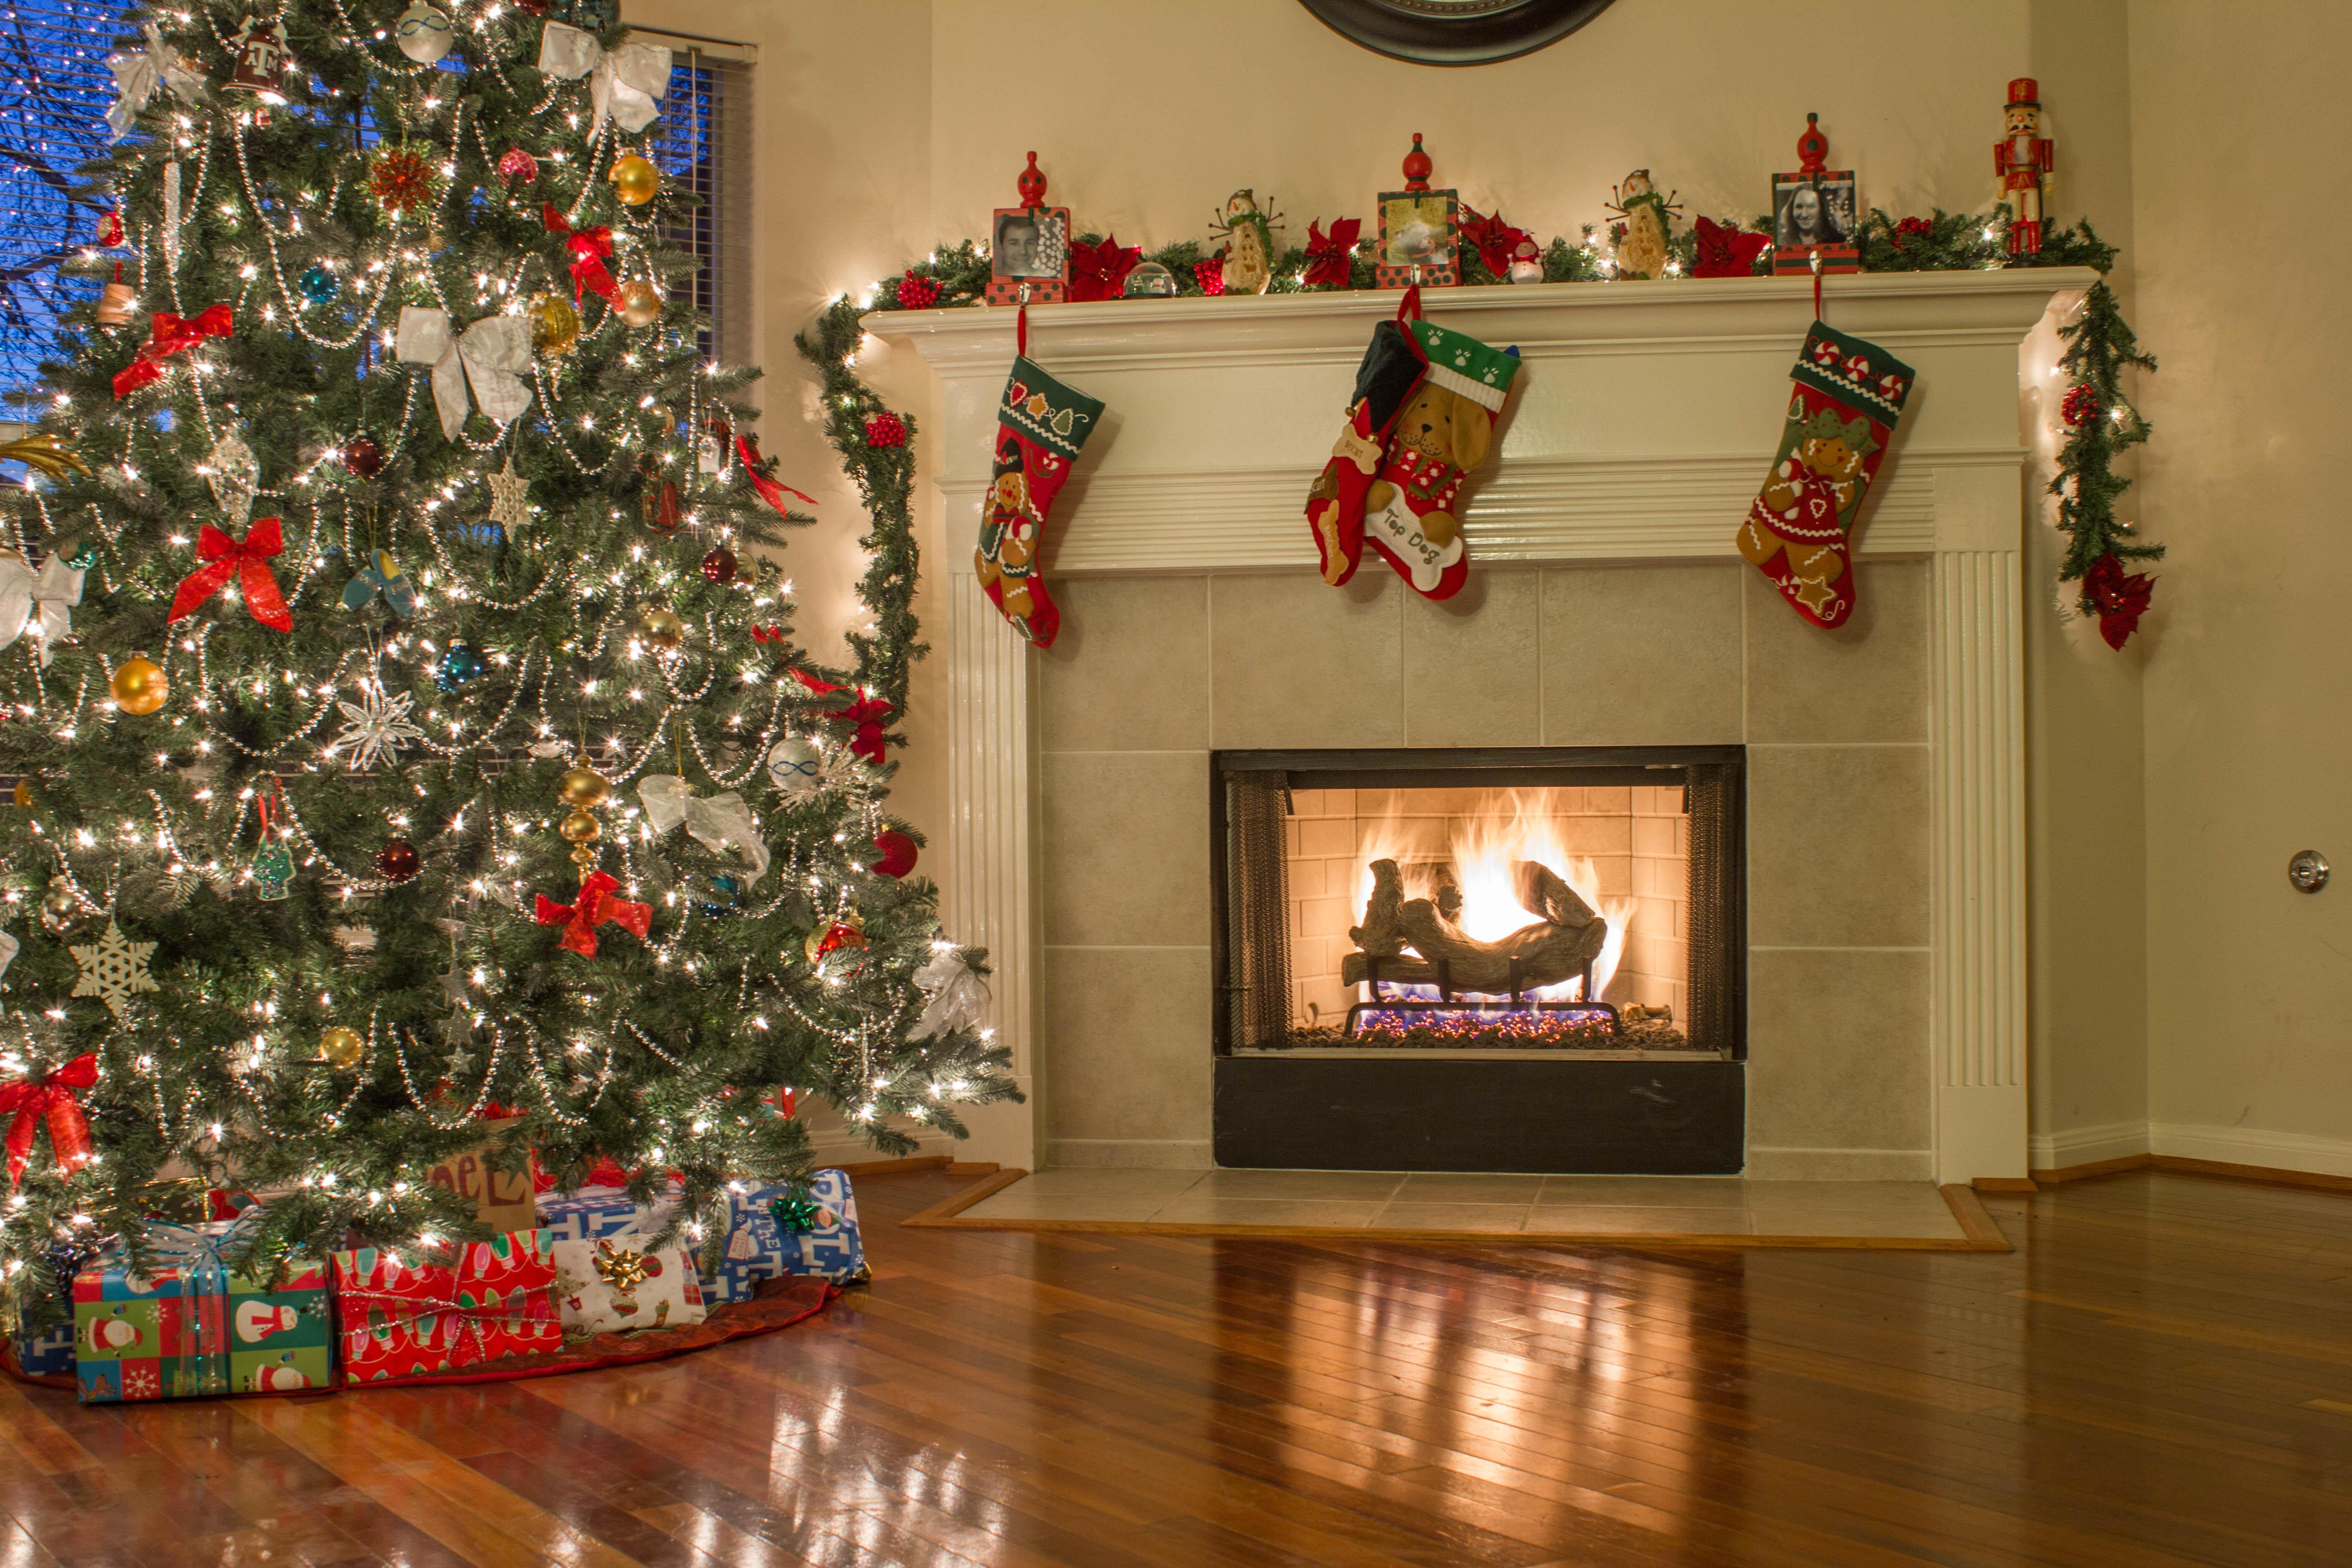 Fond D écran Vacances De Noël: Fond D'écran : Vacances, Réflexion, Bas, Feu, Lumières